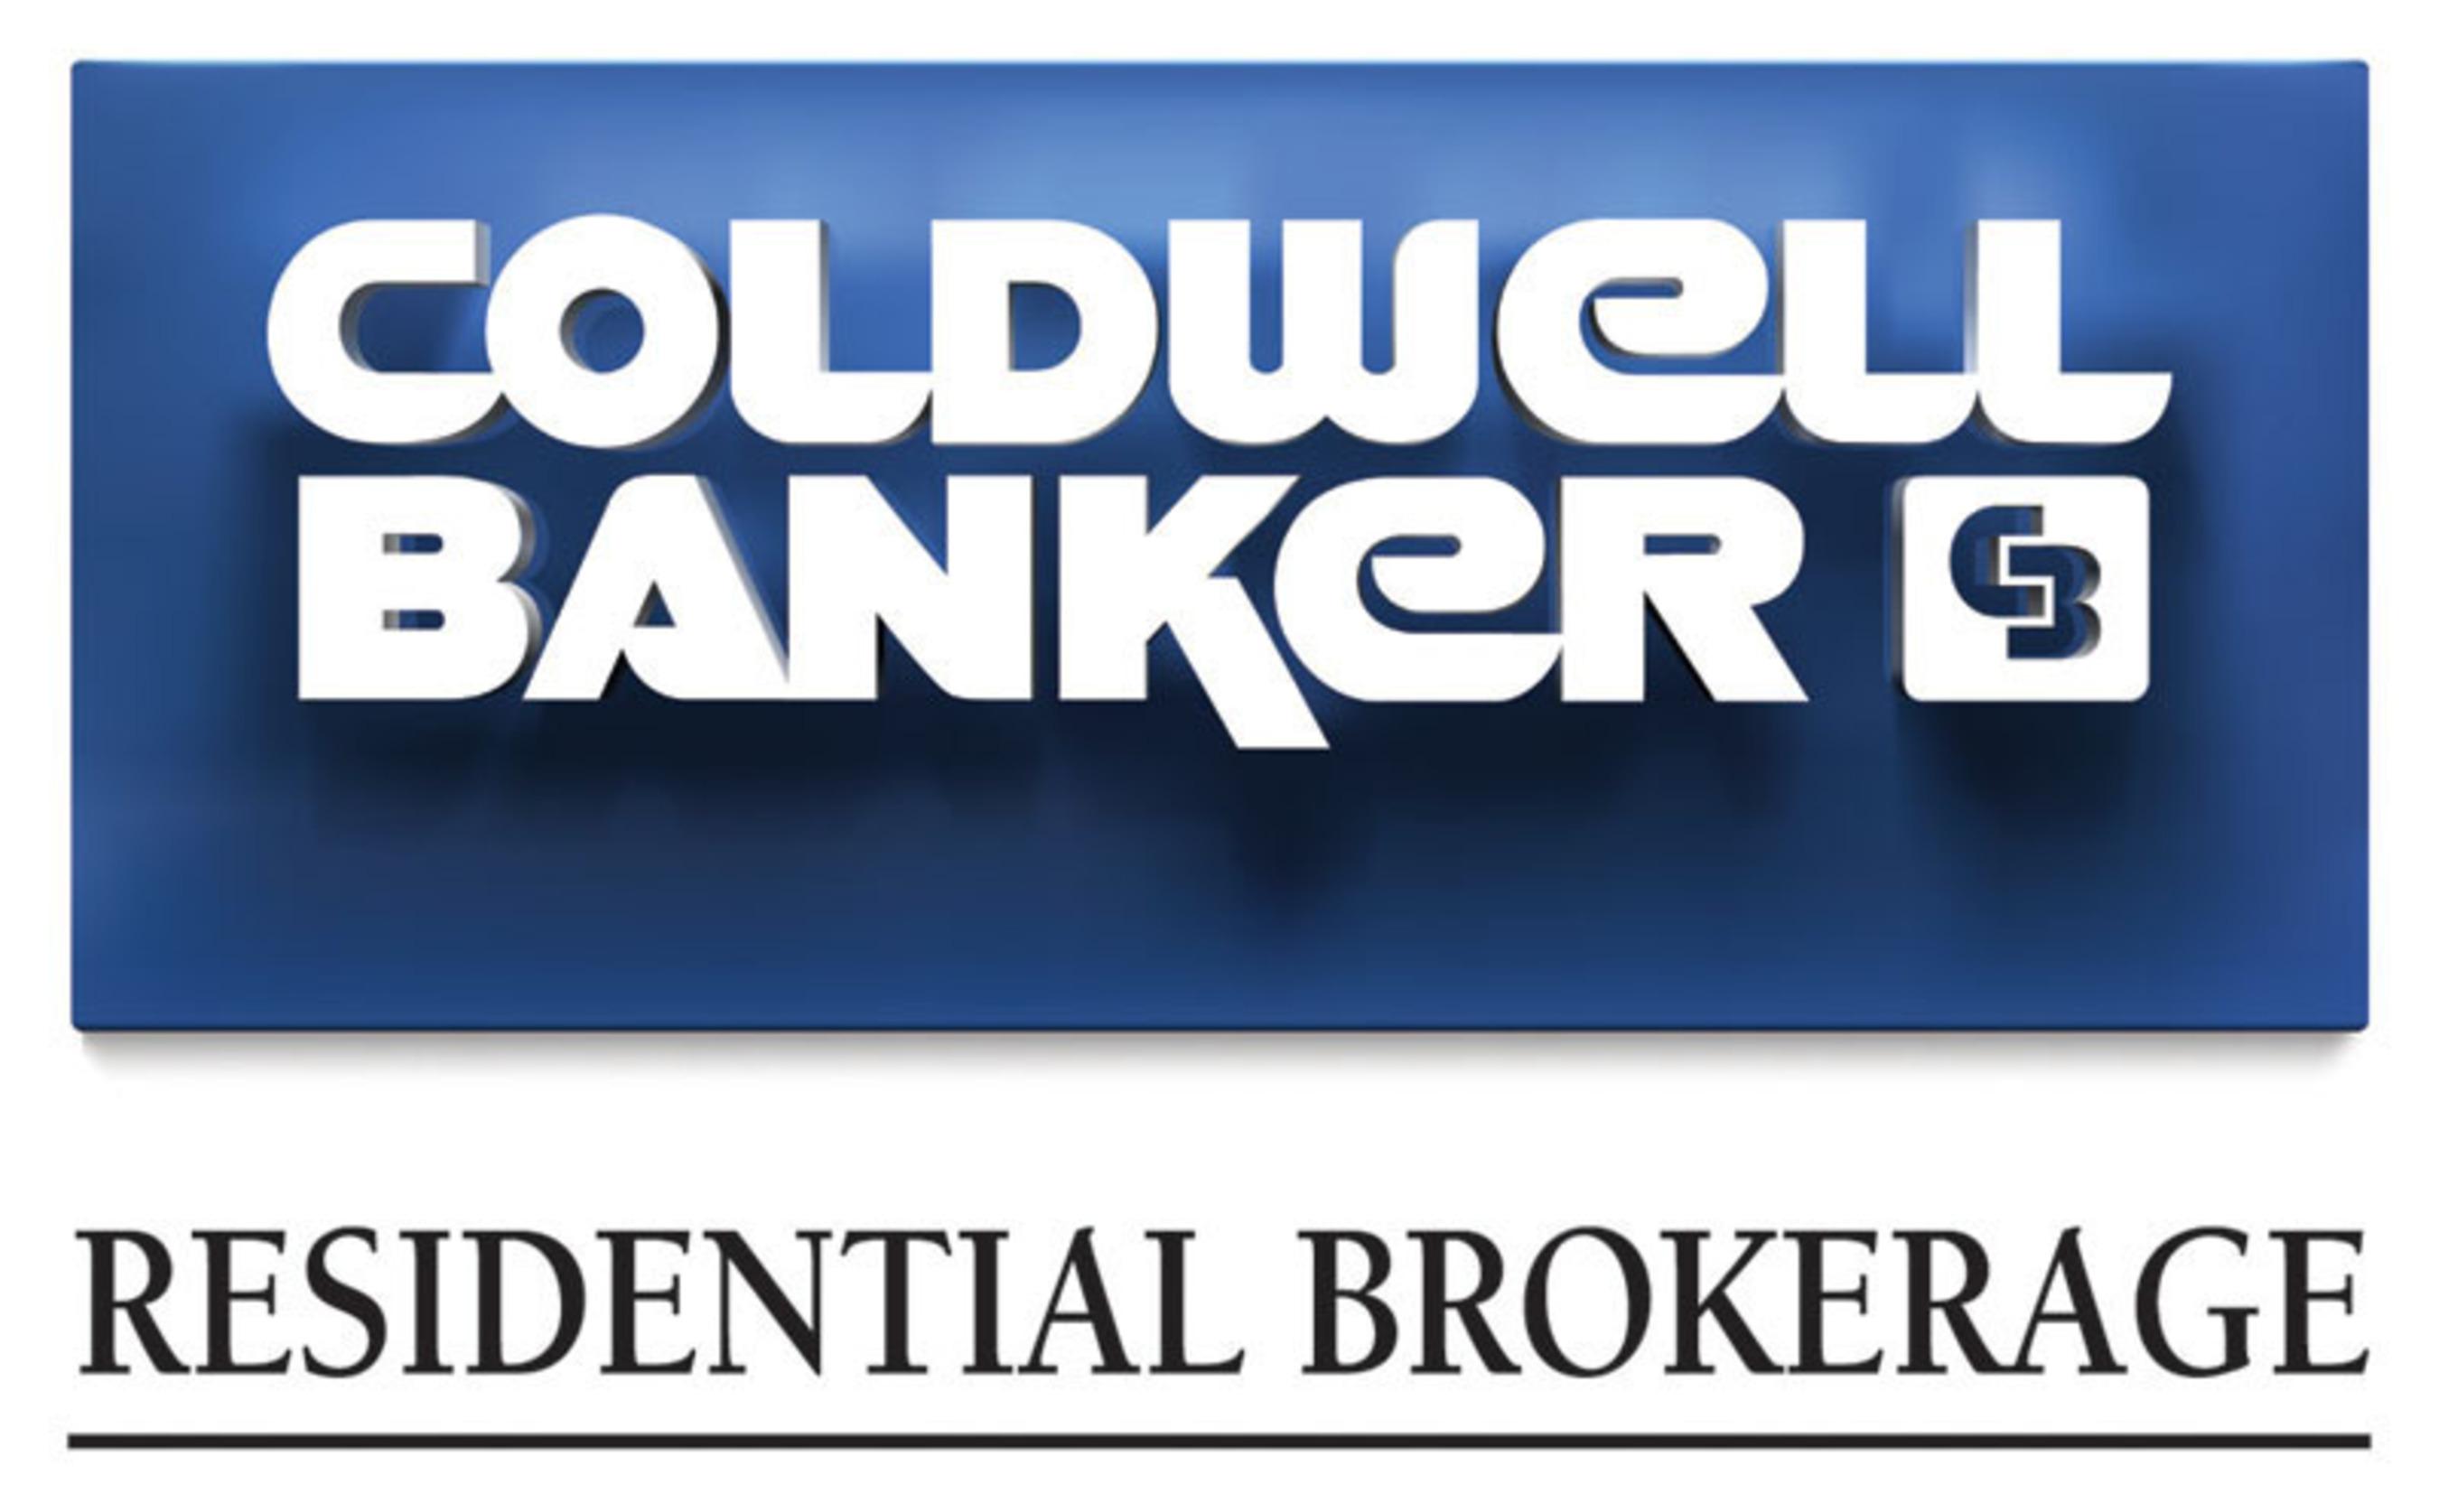 Coldwell Banker Residential Brokerage logo.